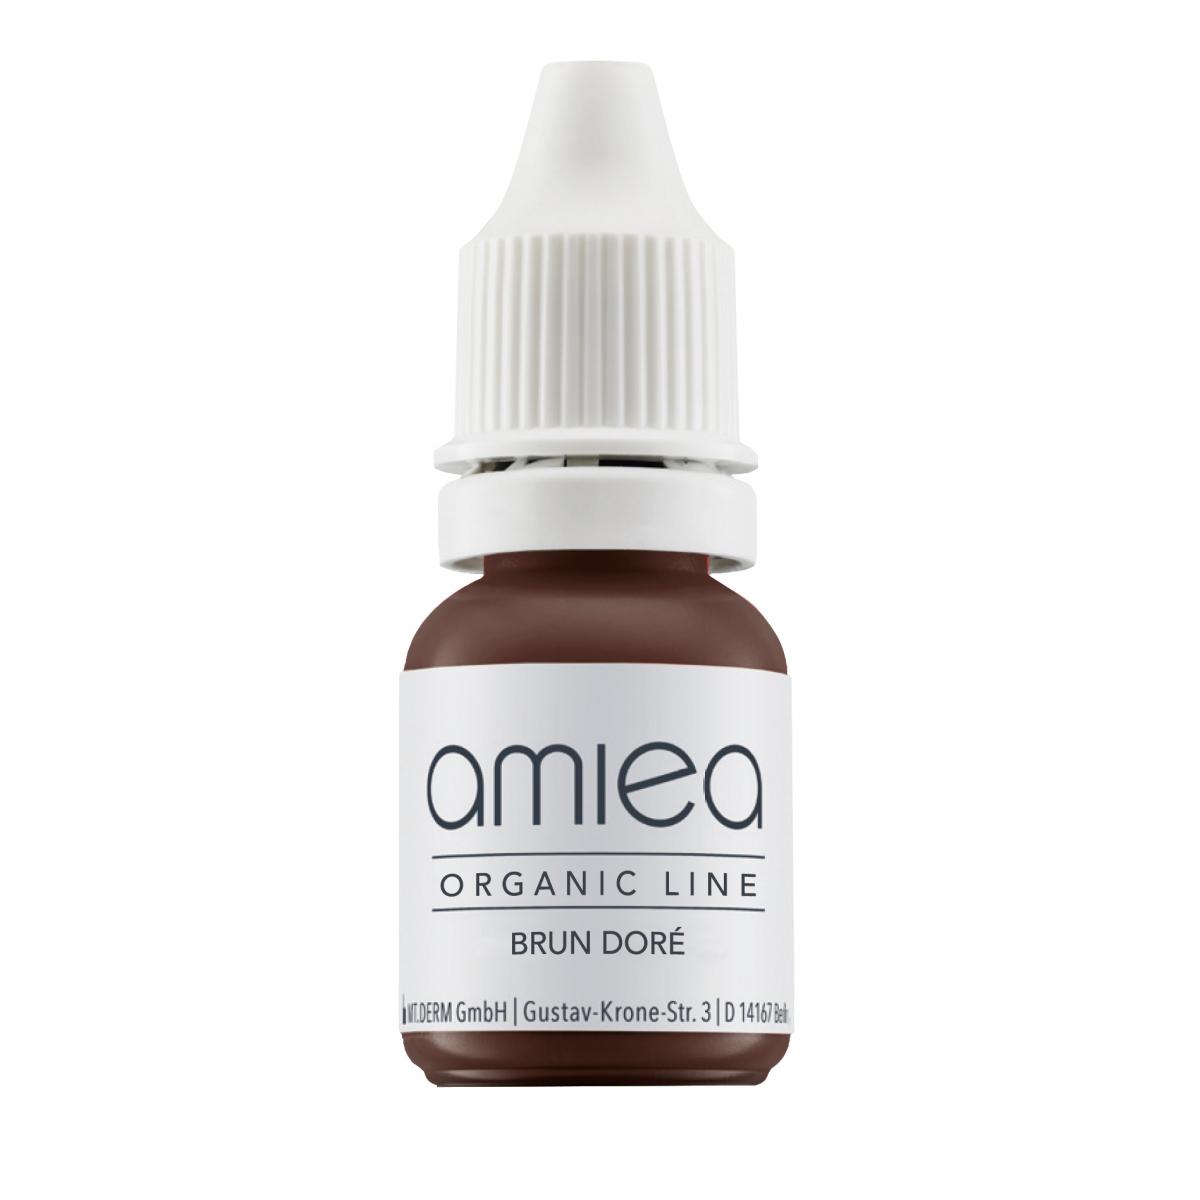 ORGANIC LINE (5ml)  - PIGMENT BRUN DORE ORGANICLINE AMIEA (5 ml)